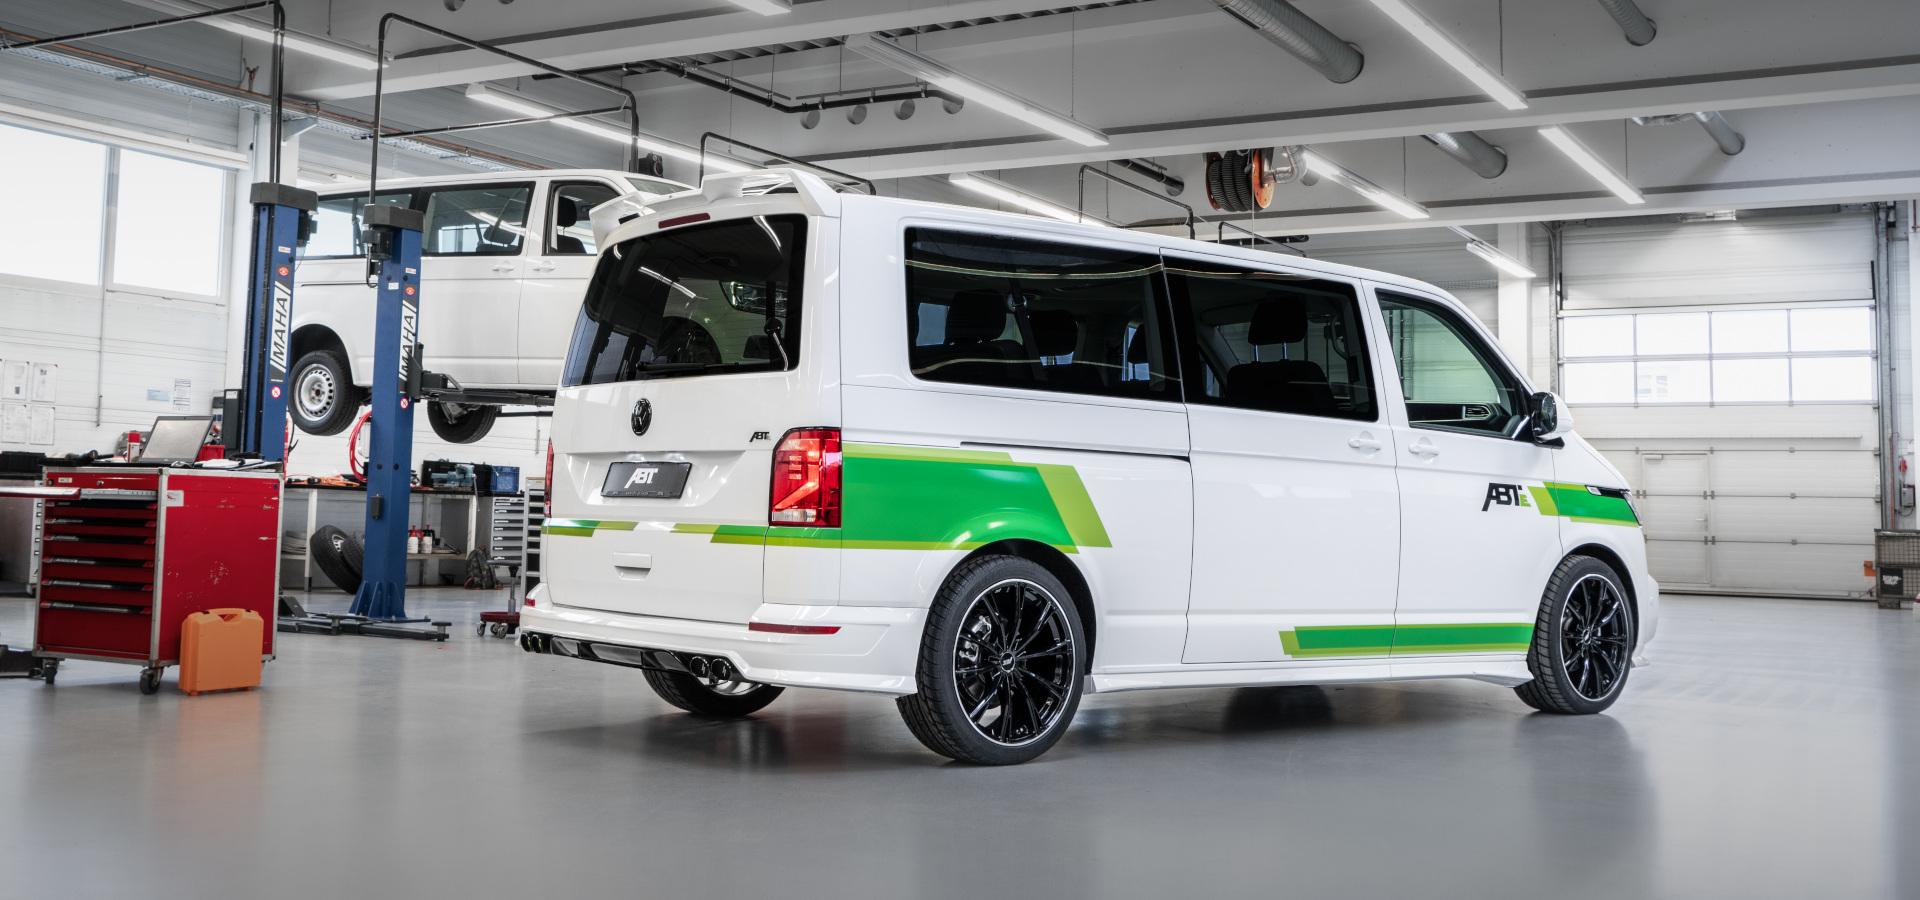 Abt E Transporter 6 1 Abt Sportsline